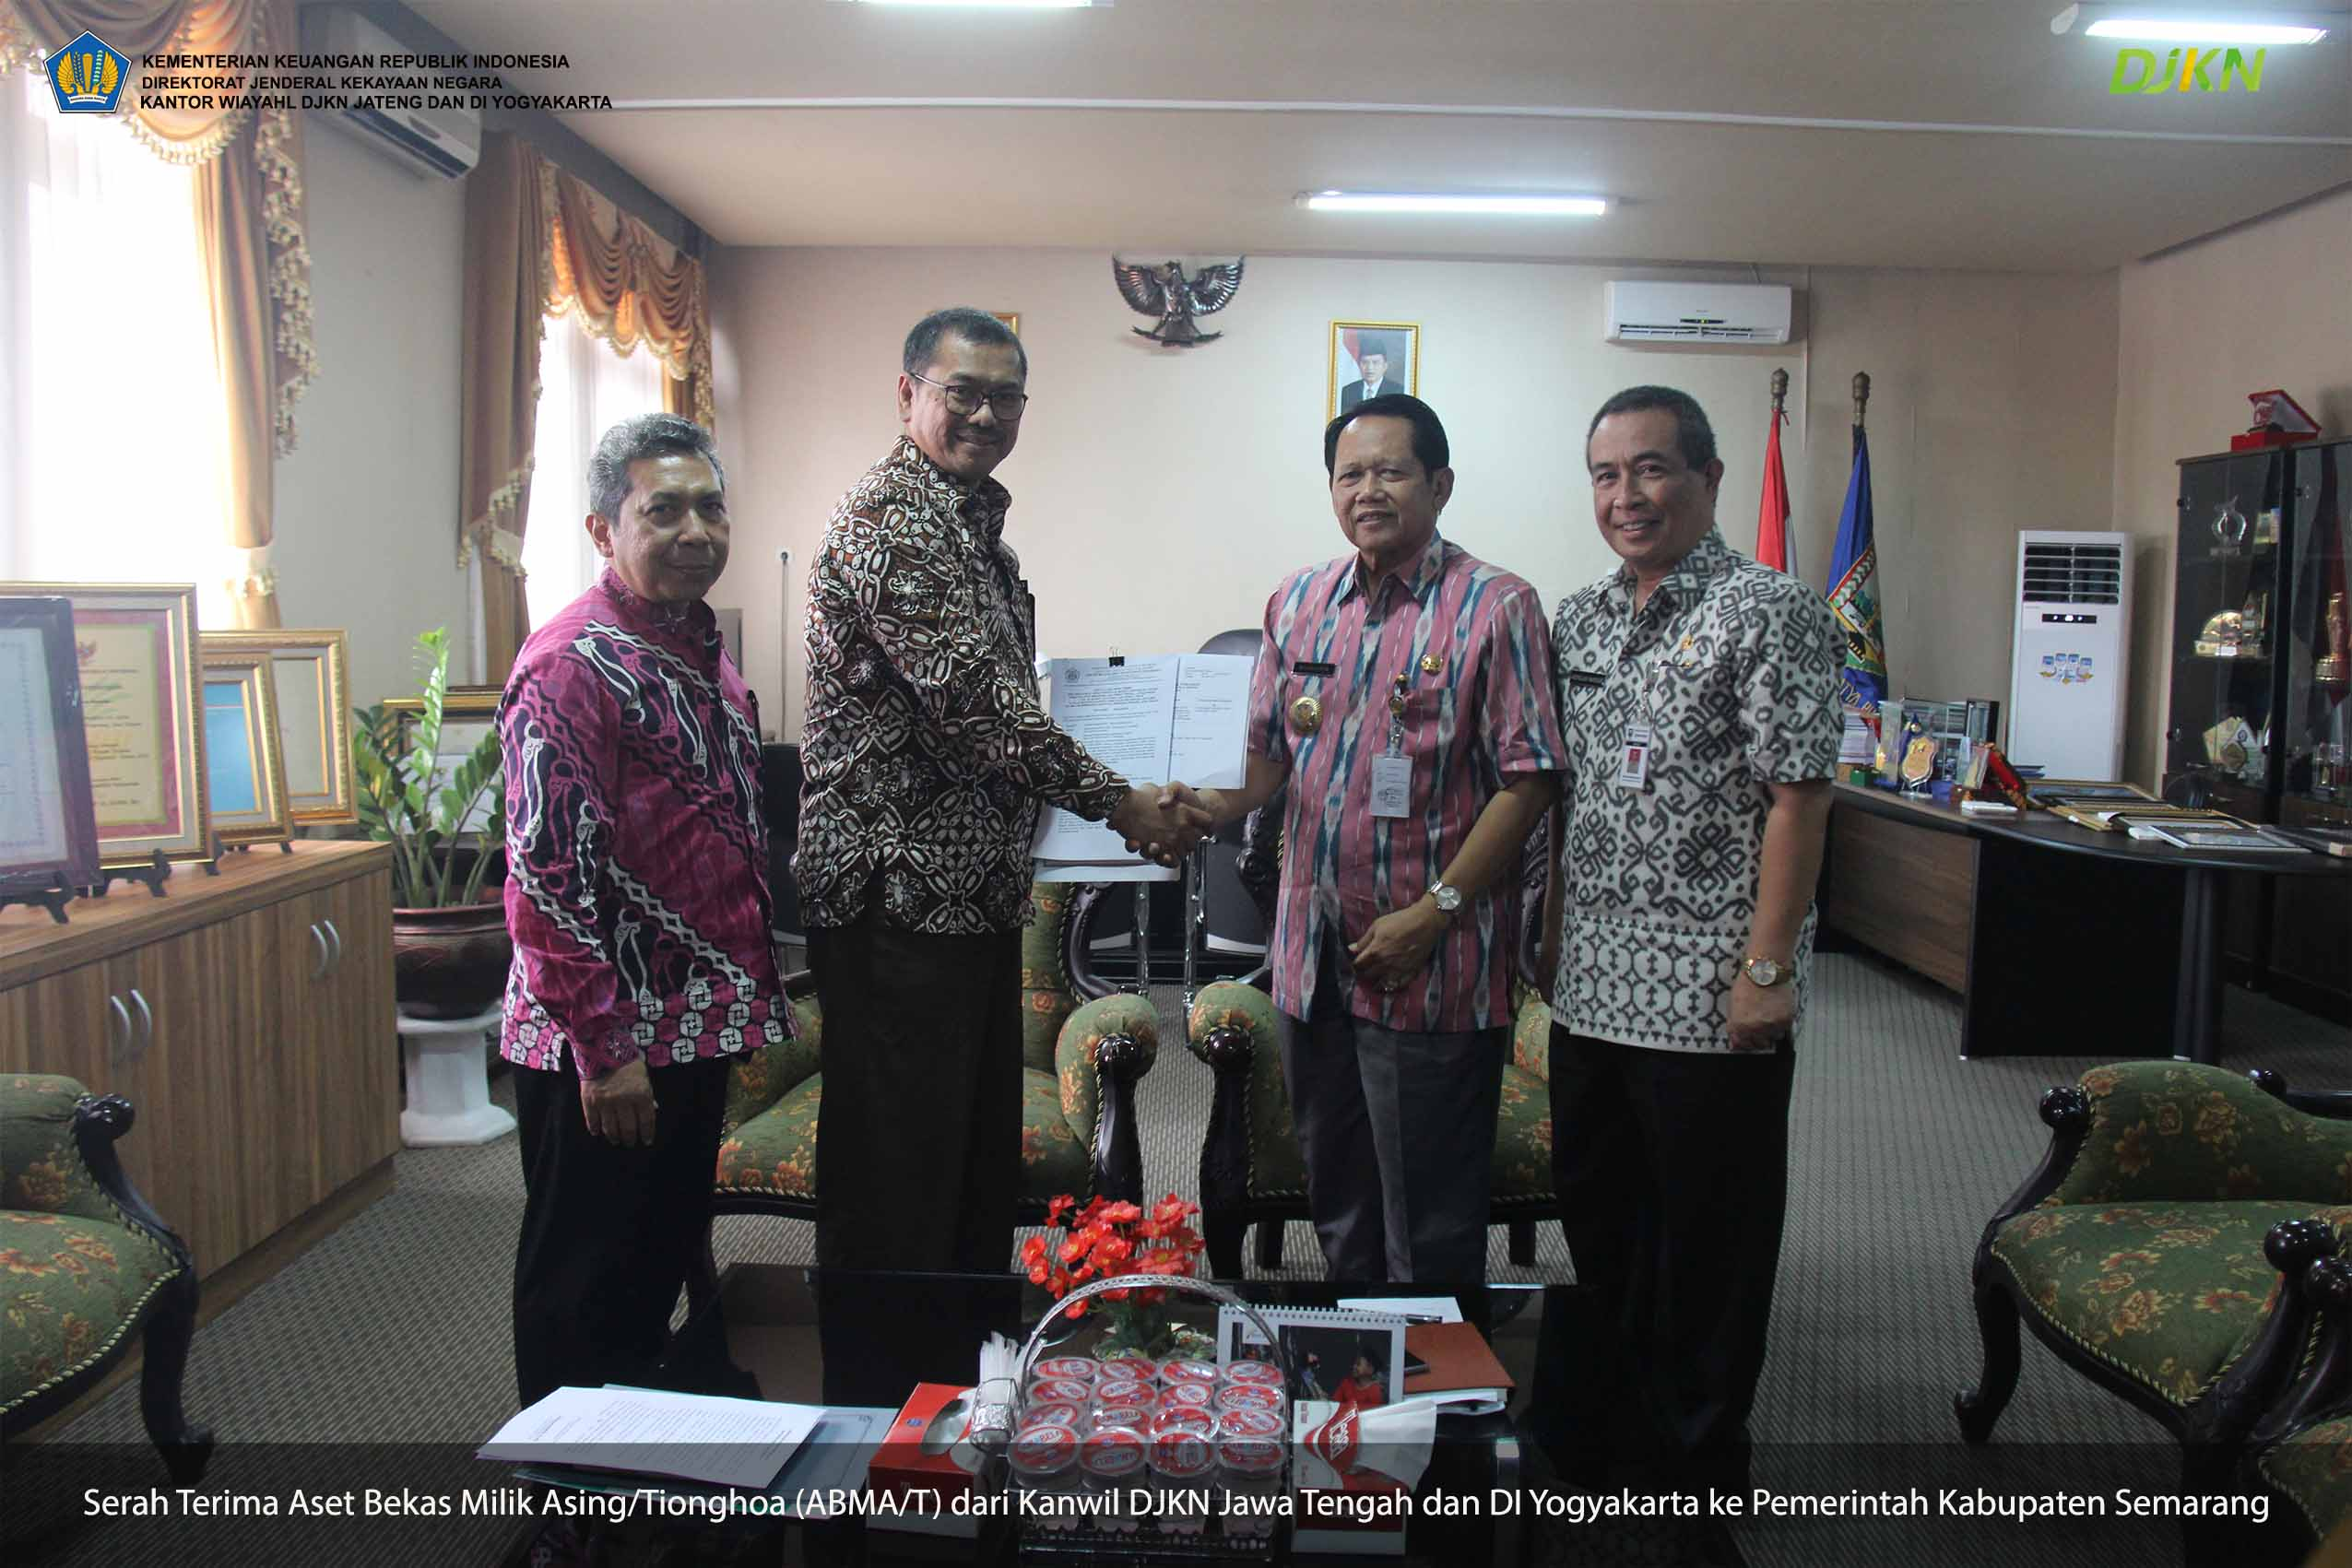 Serahkan Aset ABMA/T ke Pemda Semarang, Kepala Kanwil DJKN Jateng DIY Harap BMD Dikelola dengan Baik